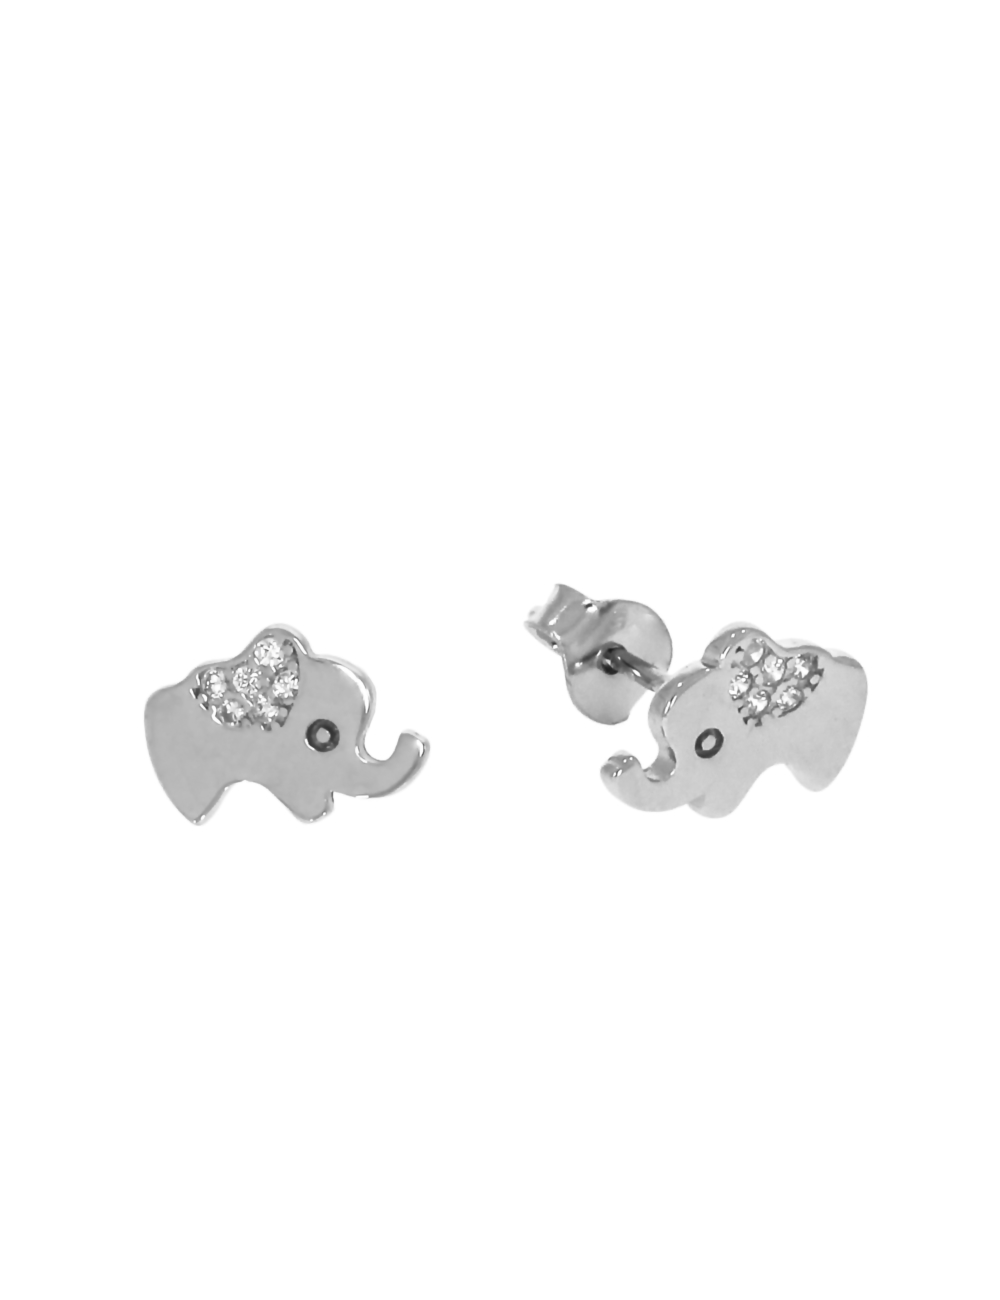 10011235 Kolczyki srebrne pr.925 z cyrkoniami